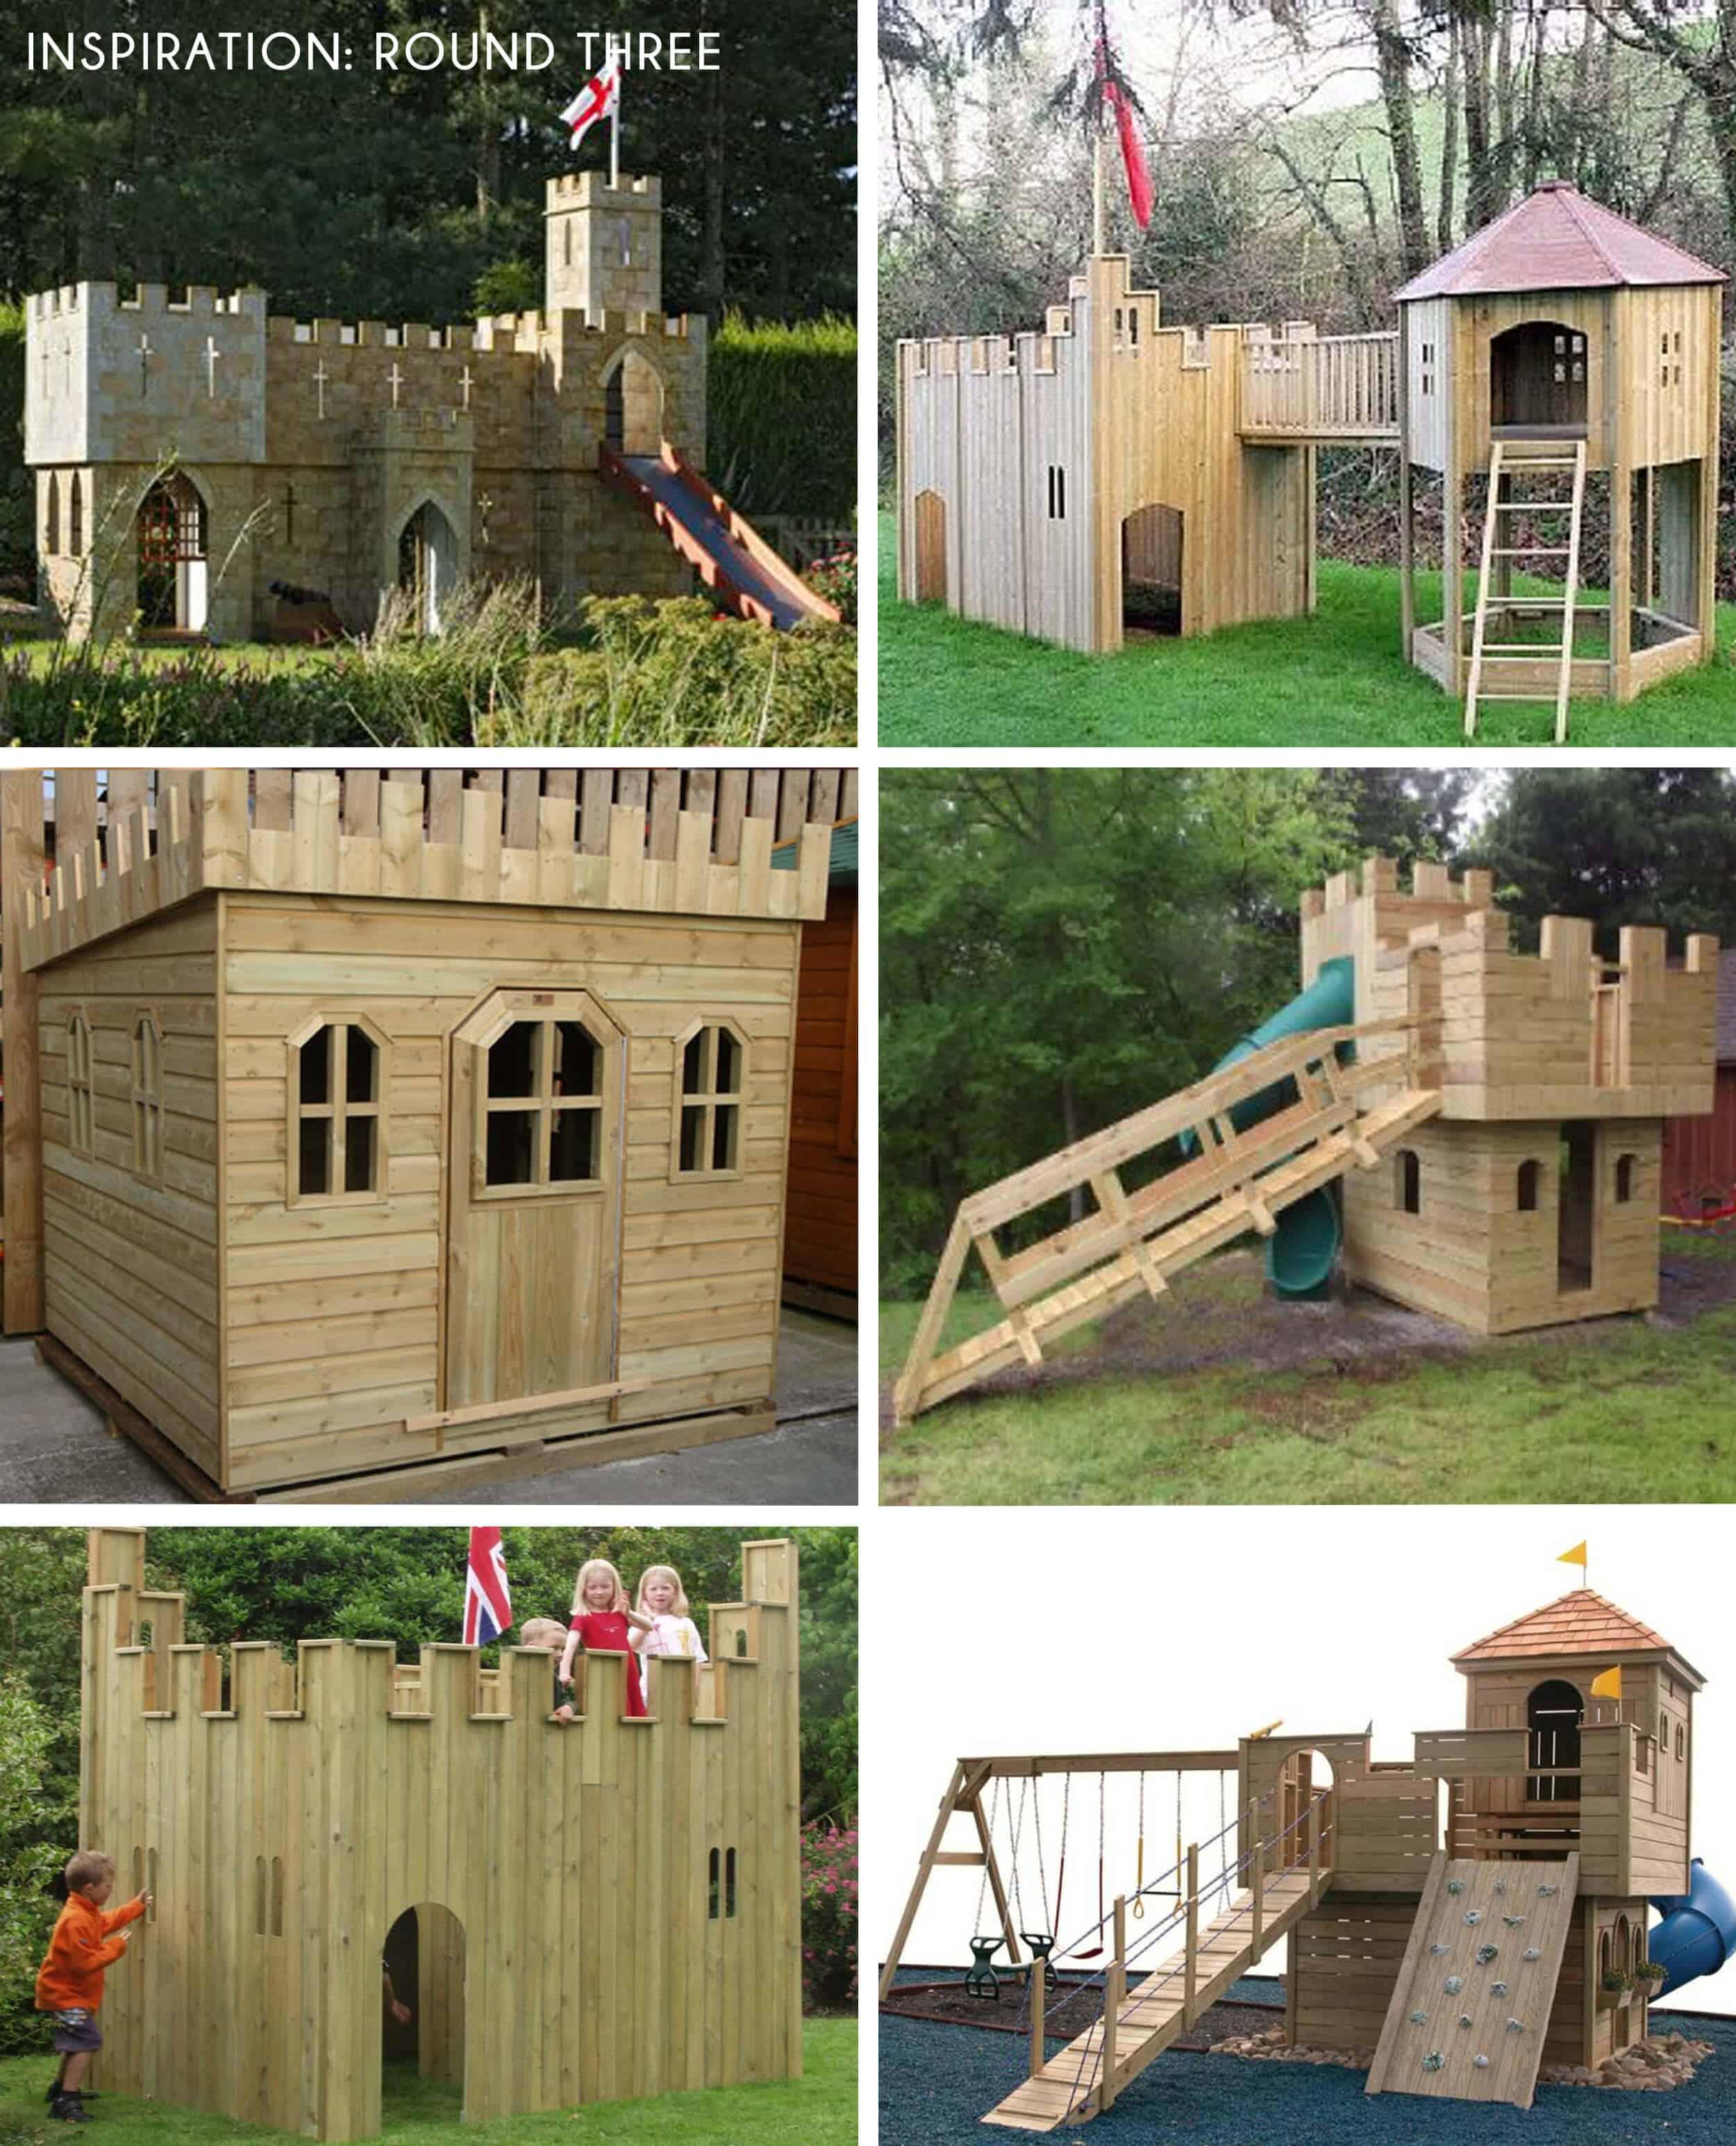 Emily-Henderson_Waverly_Backyard_Playfort_Castle_Inspiration_Round-3